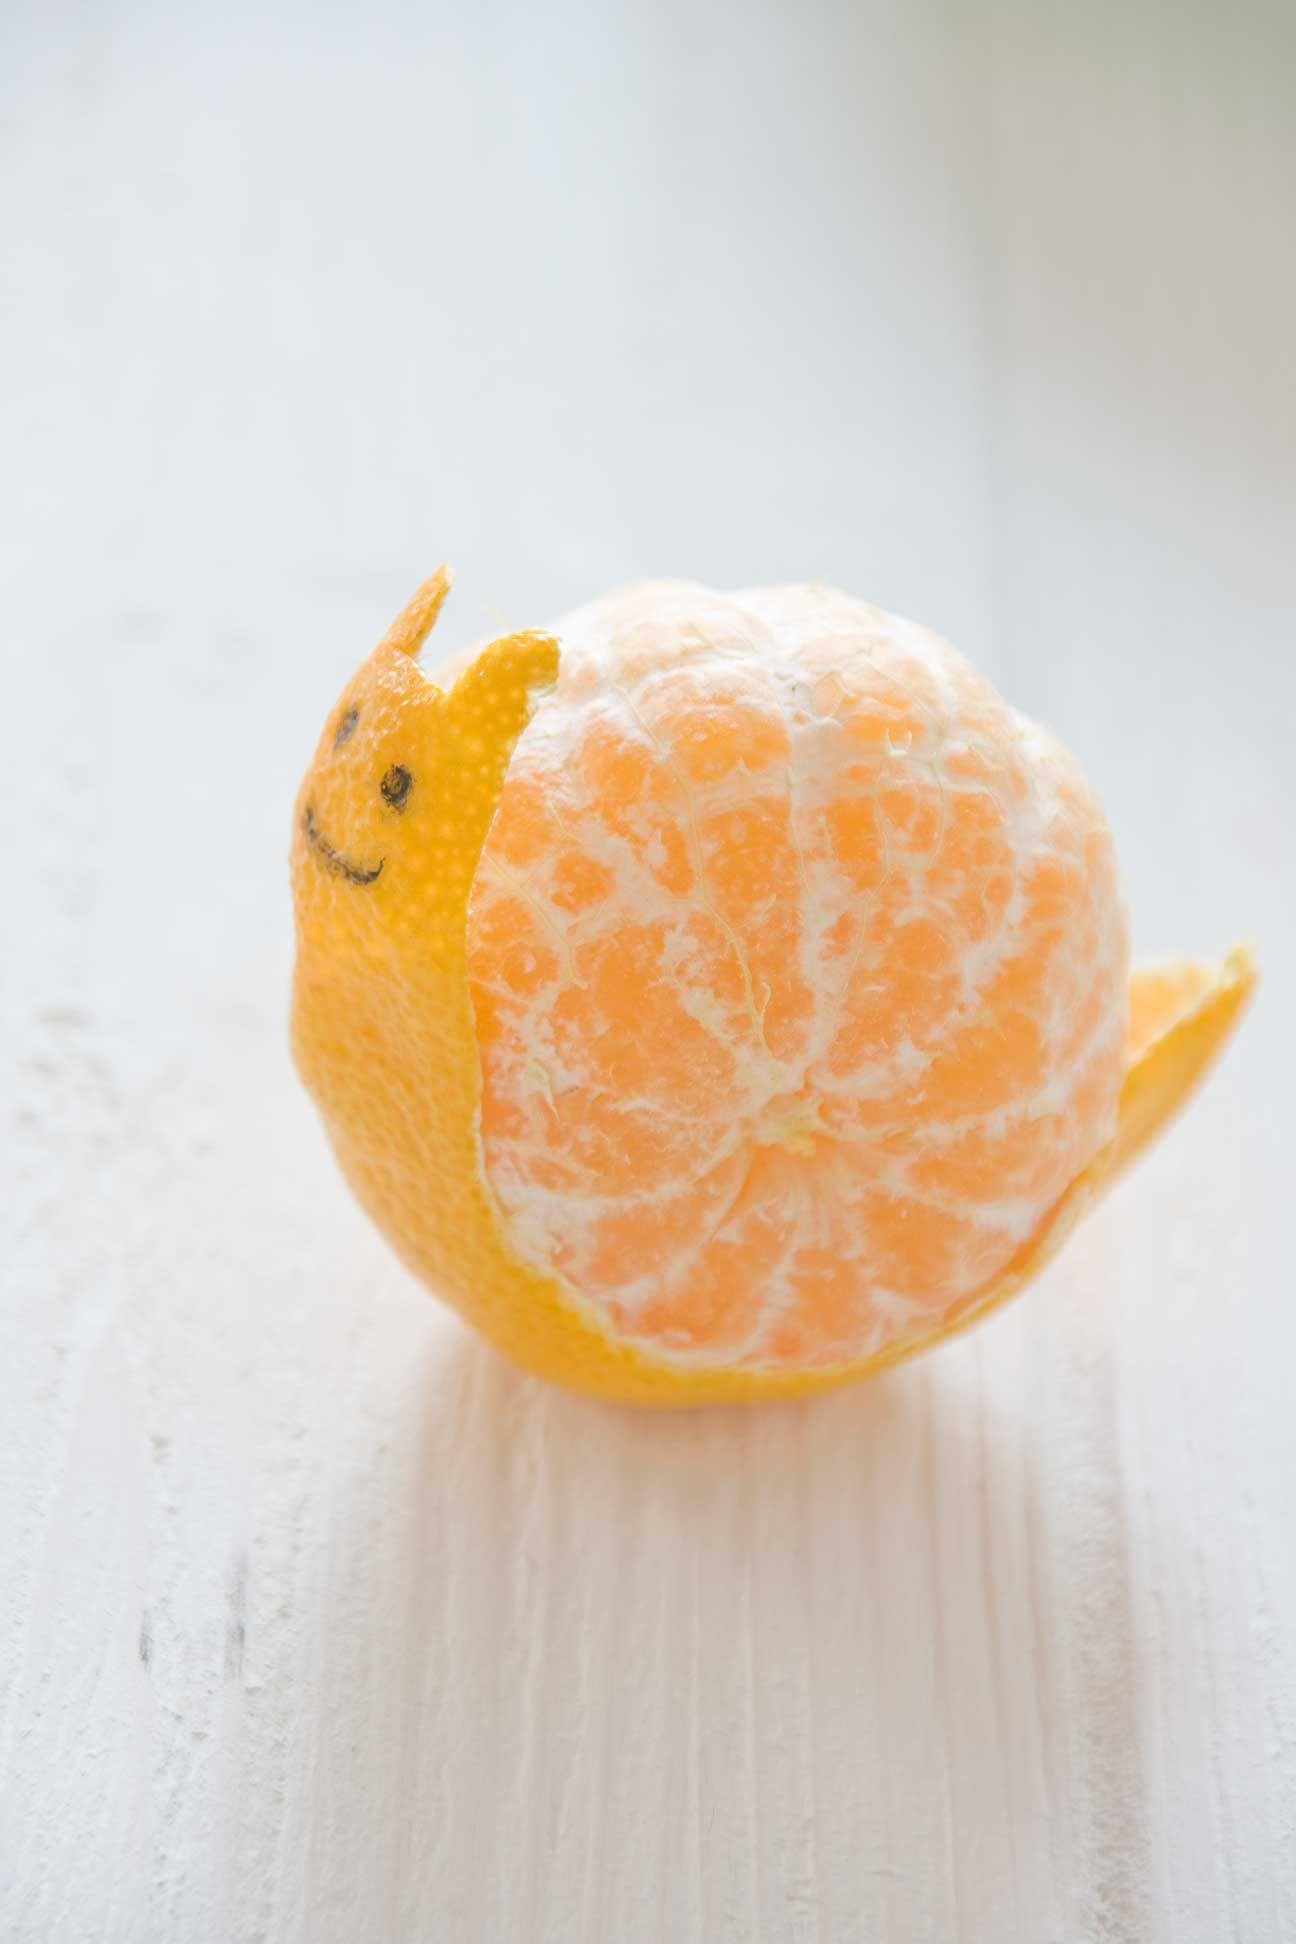 Tangerine animals